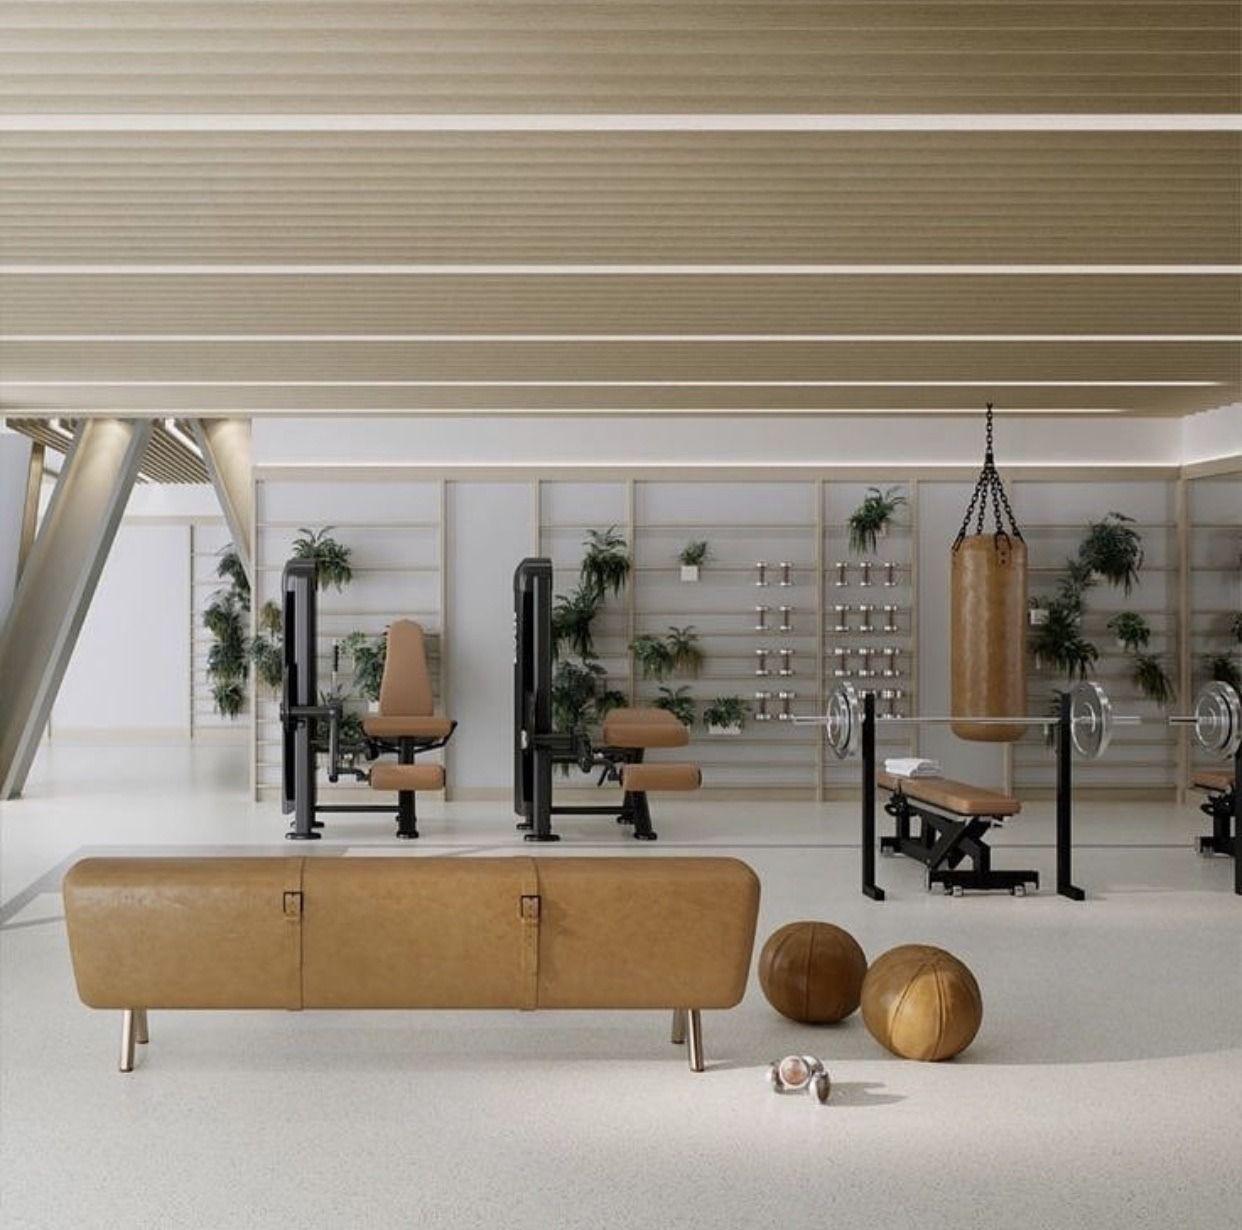 Home Gym Design Ideas Basement: Thecata Ya Thecata Ya In 2020